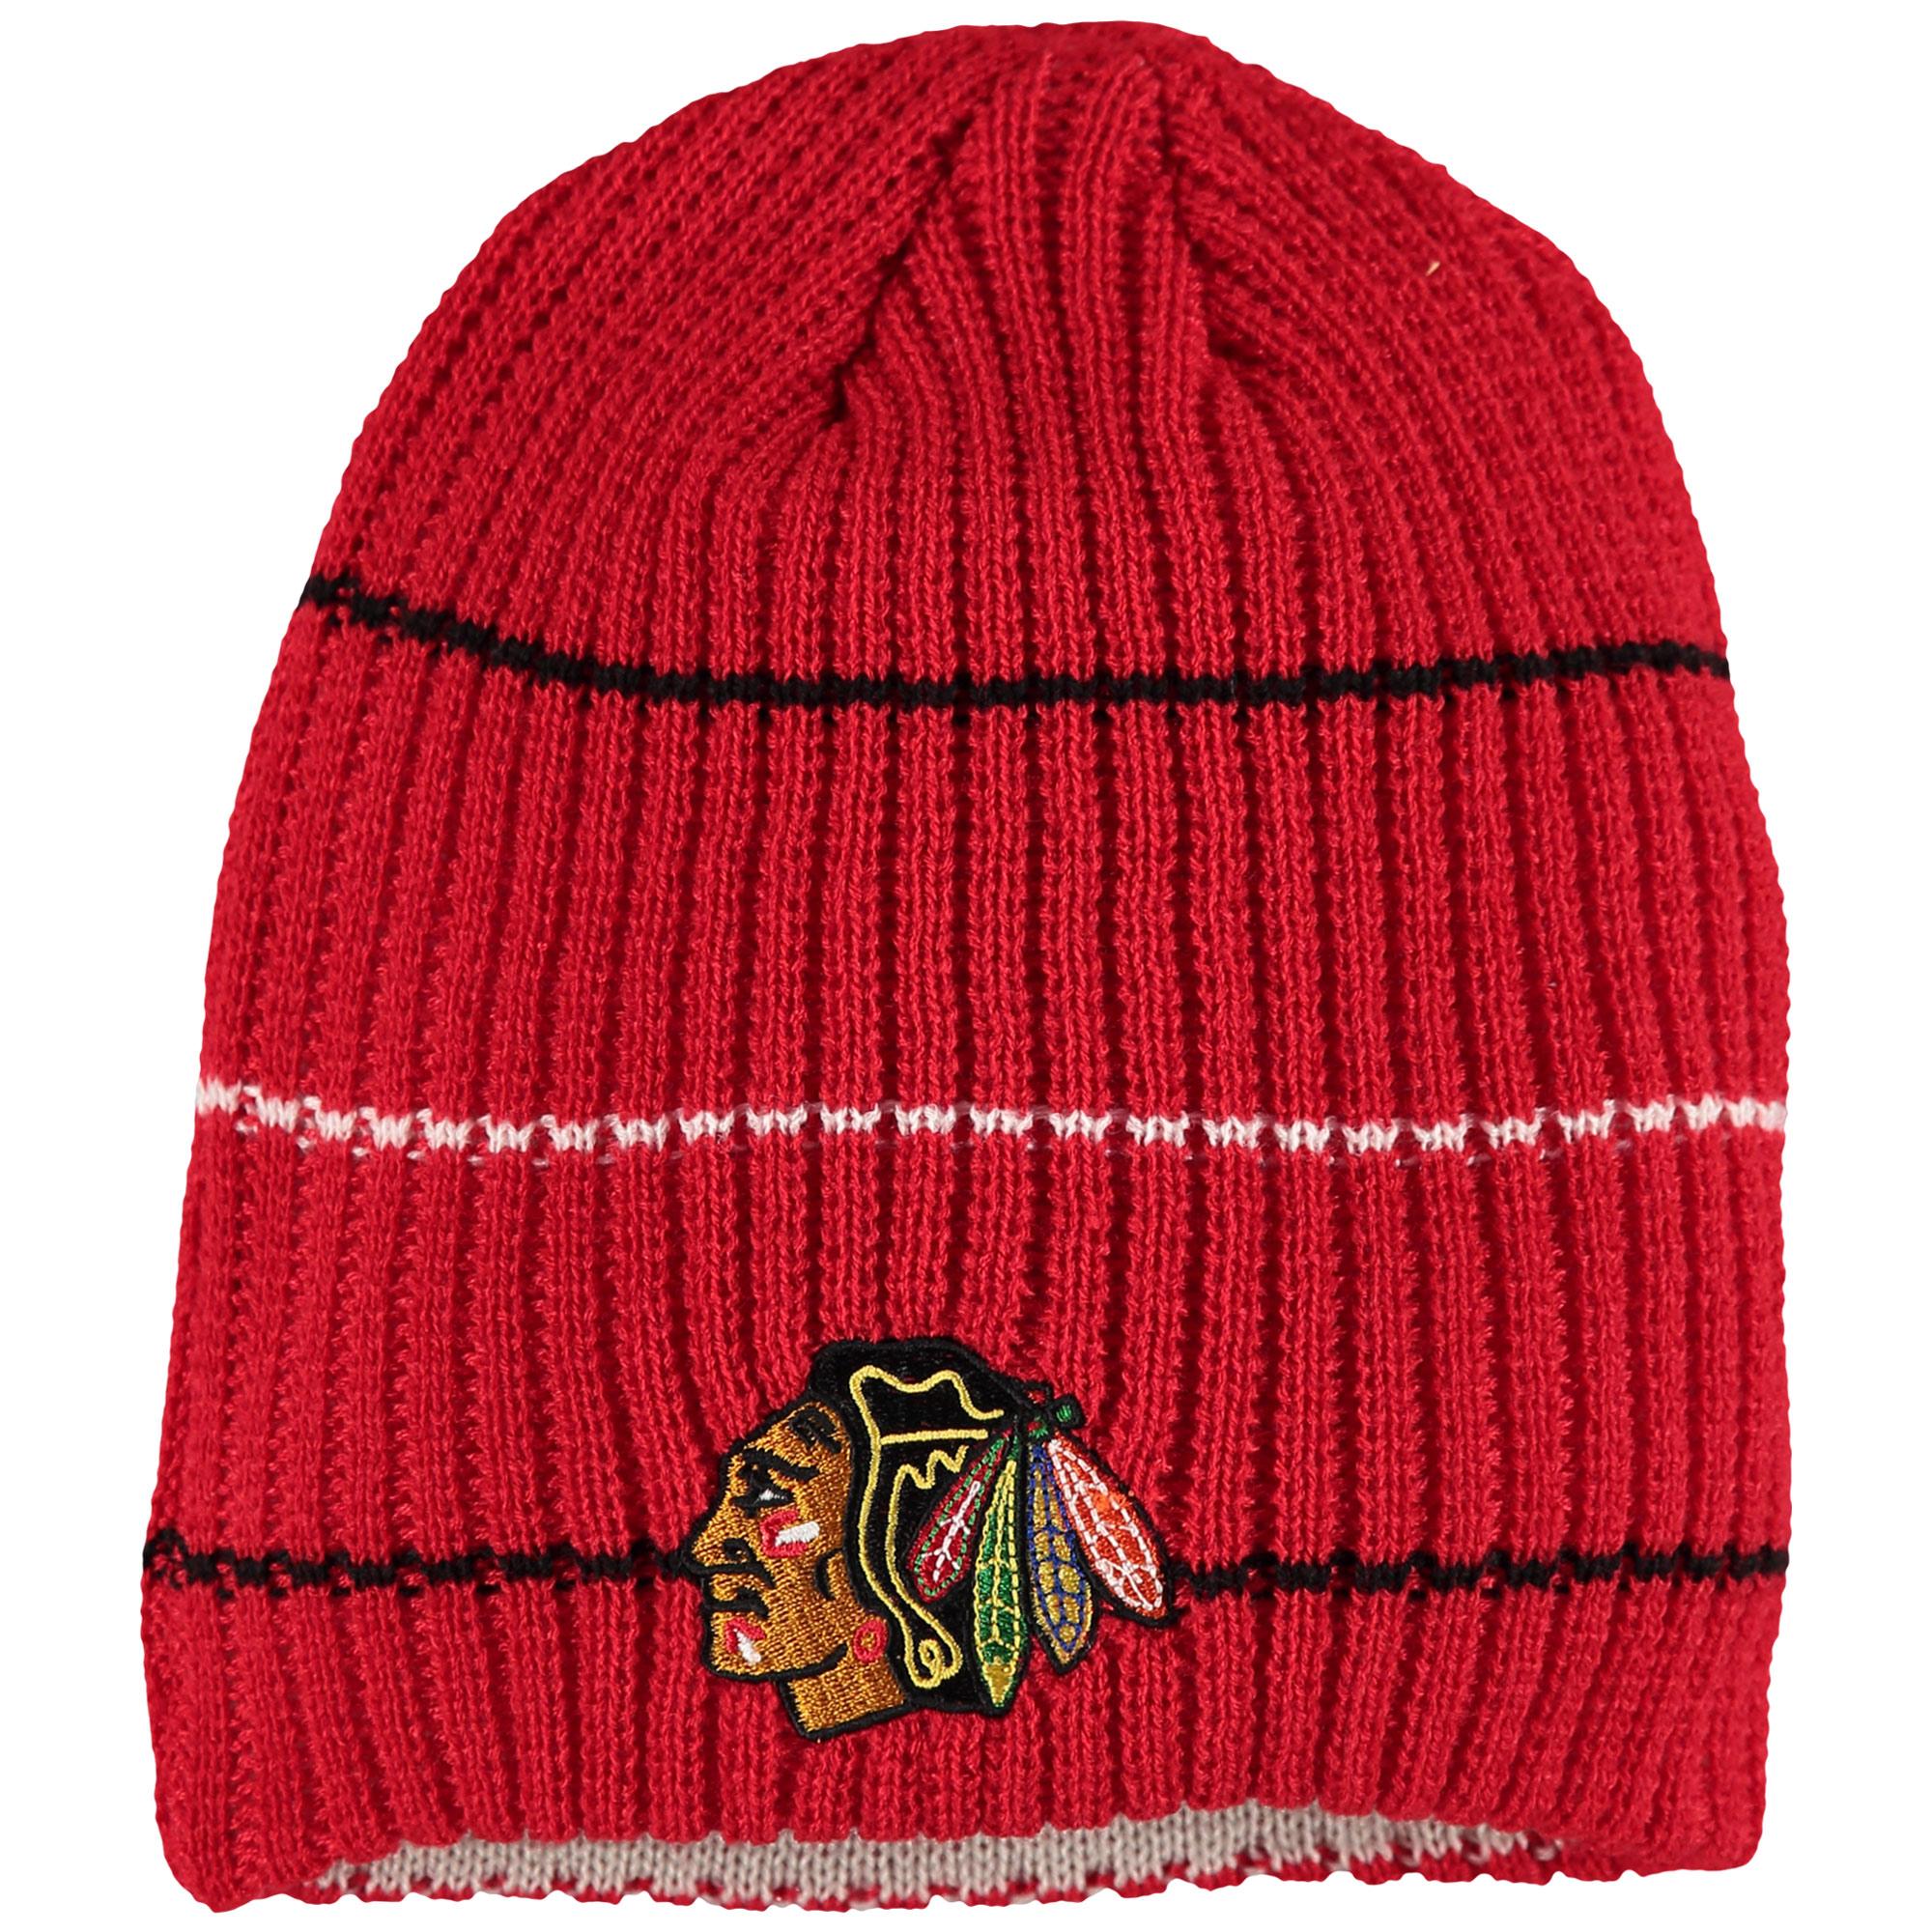 Chicago Blackhawks Reebok Face-Off Textured Stripe Beanie - Red - OSFA